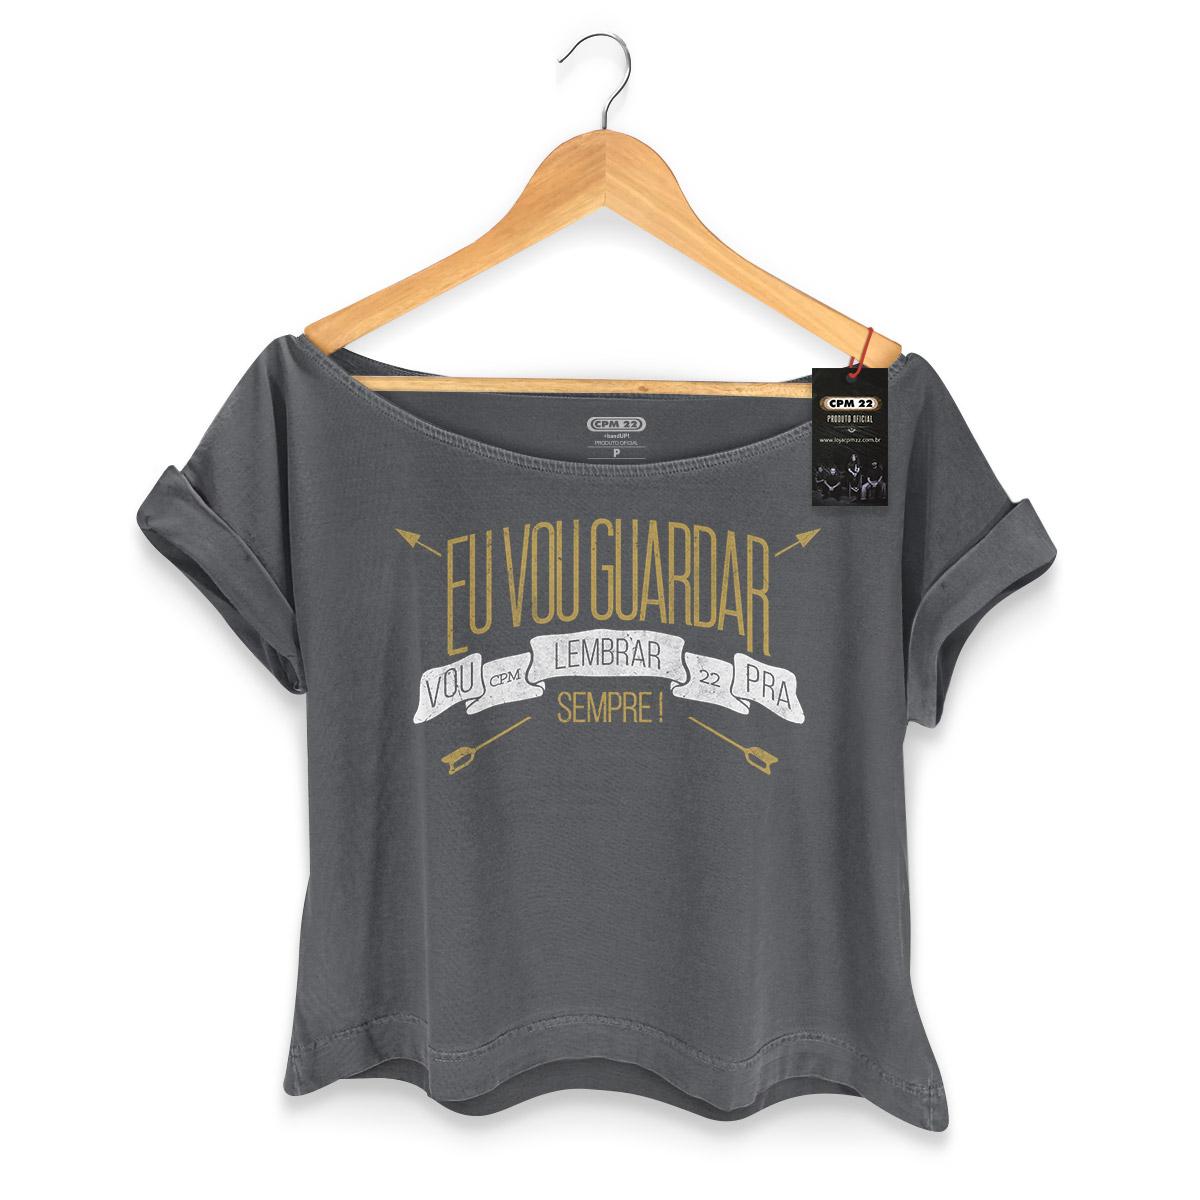 T-shirt Premium Feminina CPM 22 Pra Sempre